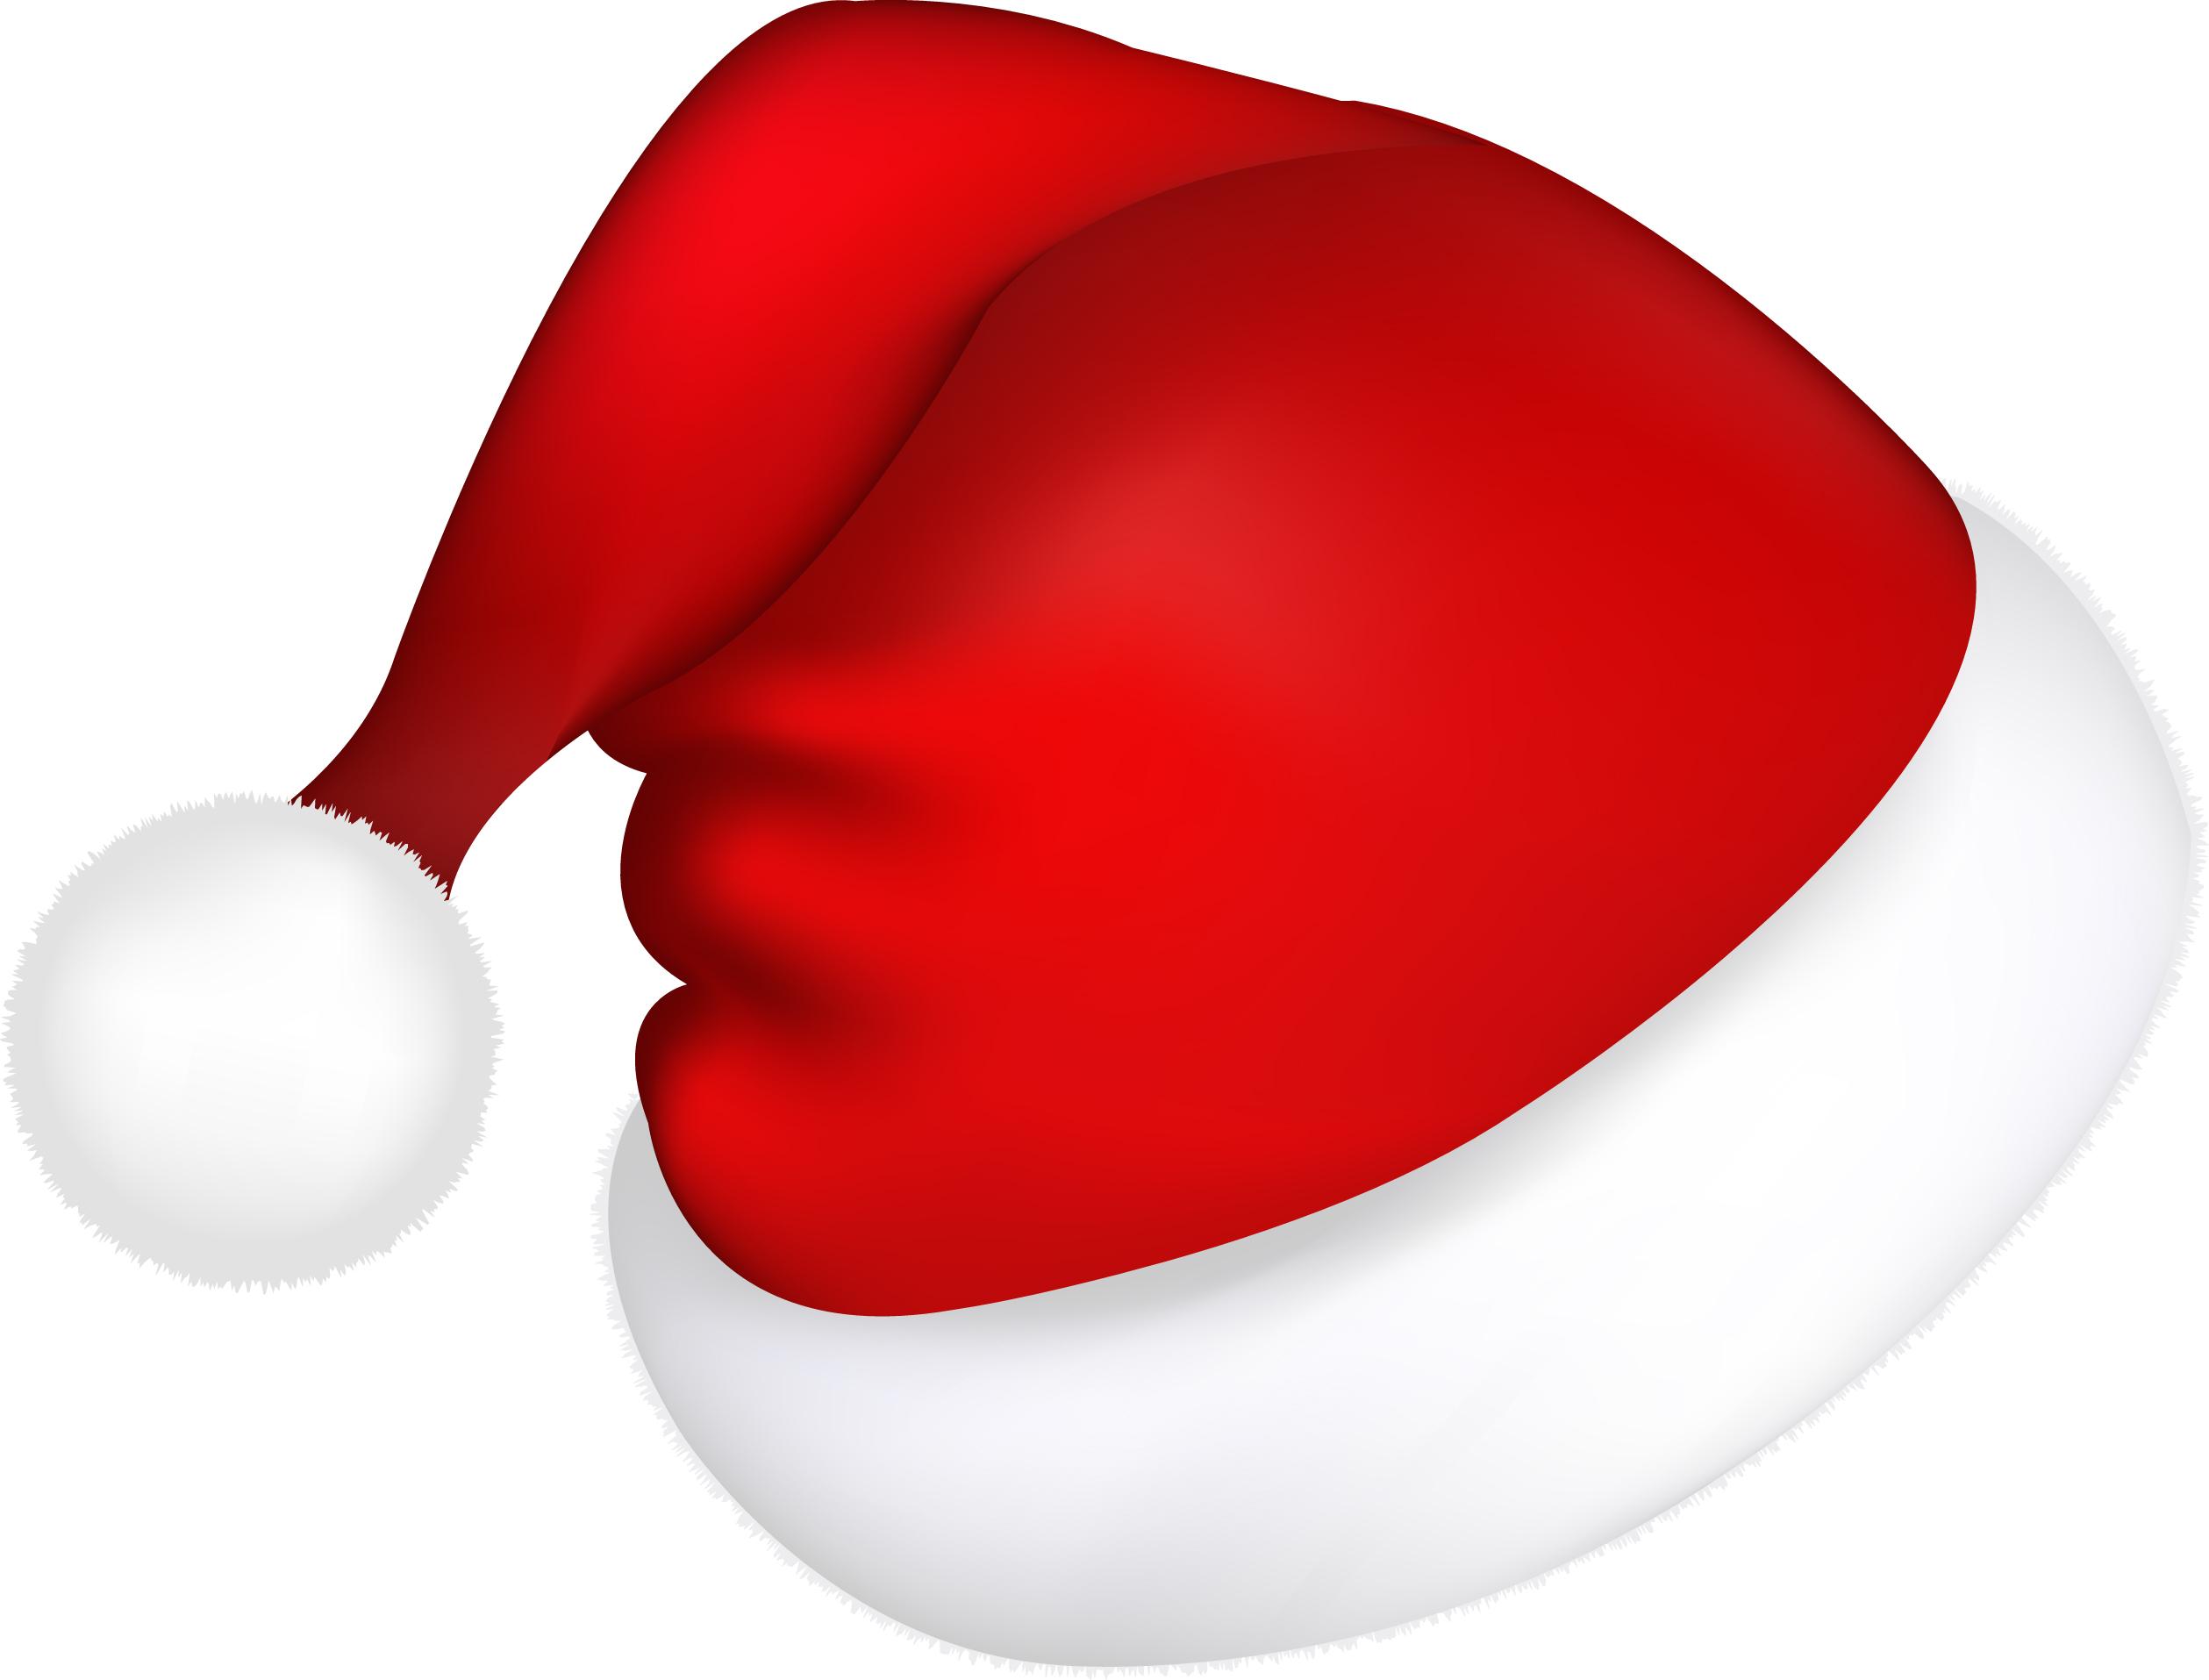 Santa hat clipart free download.